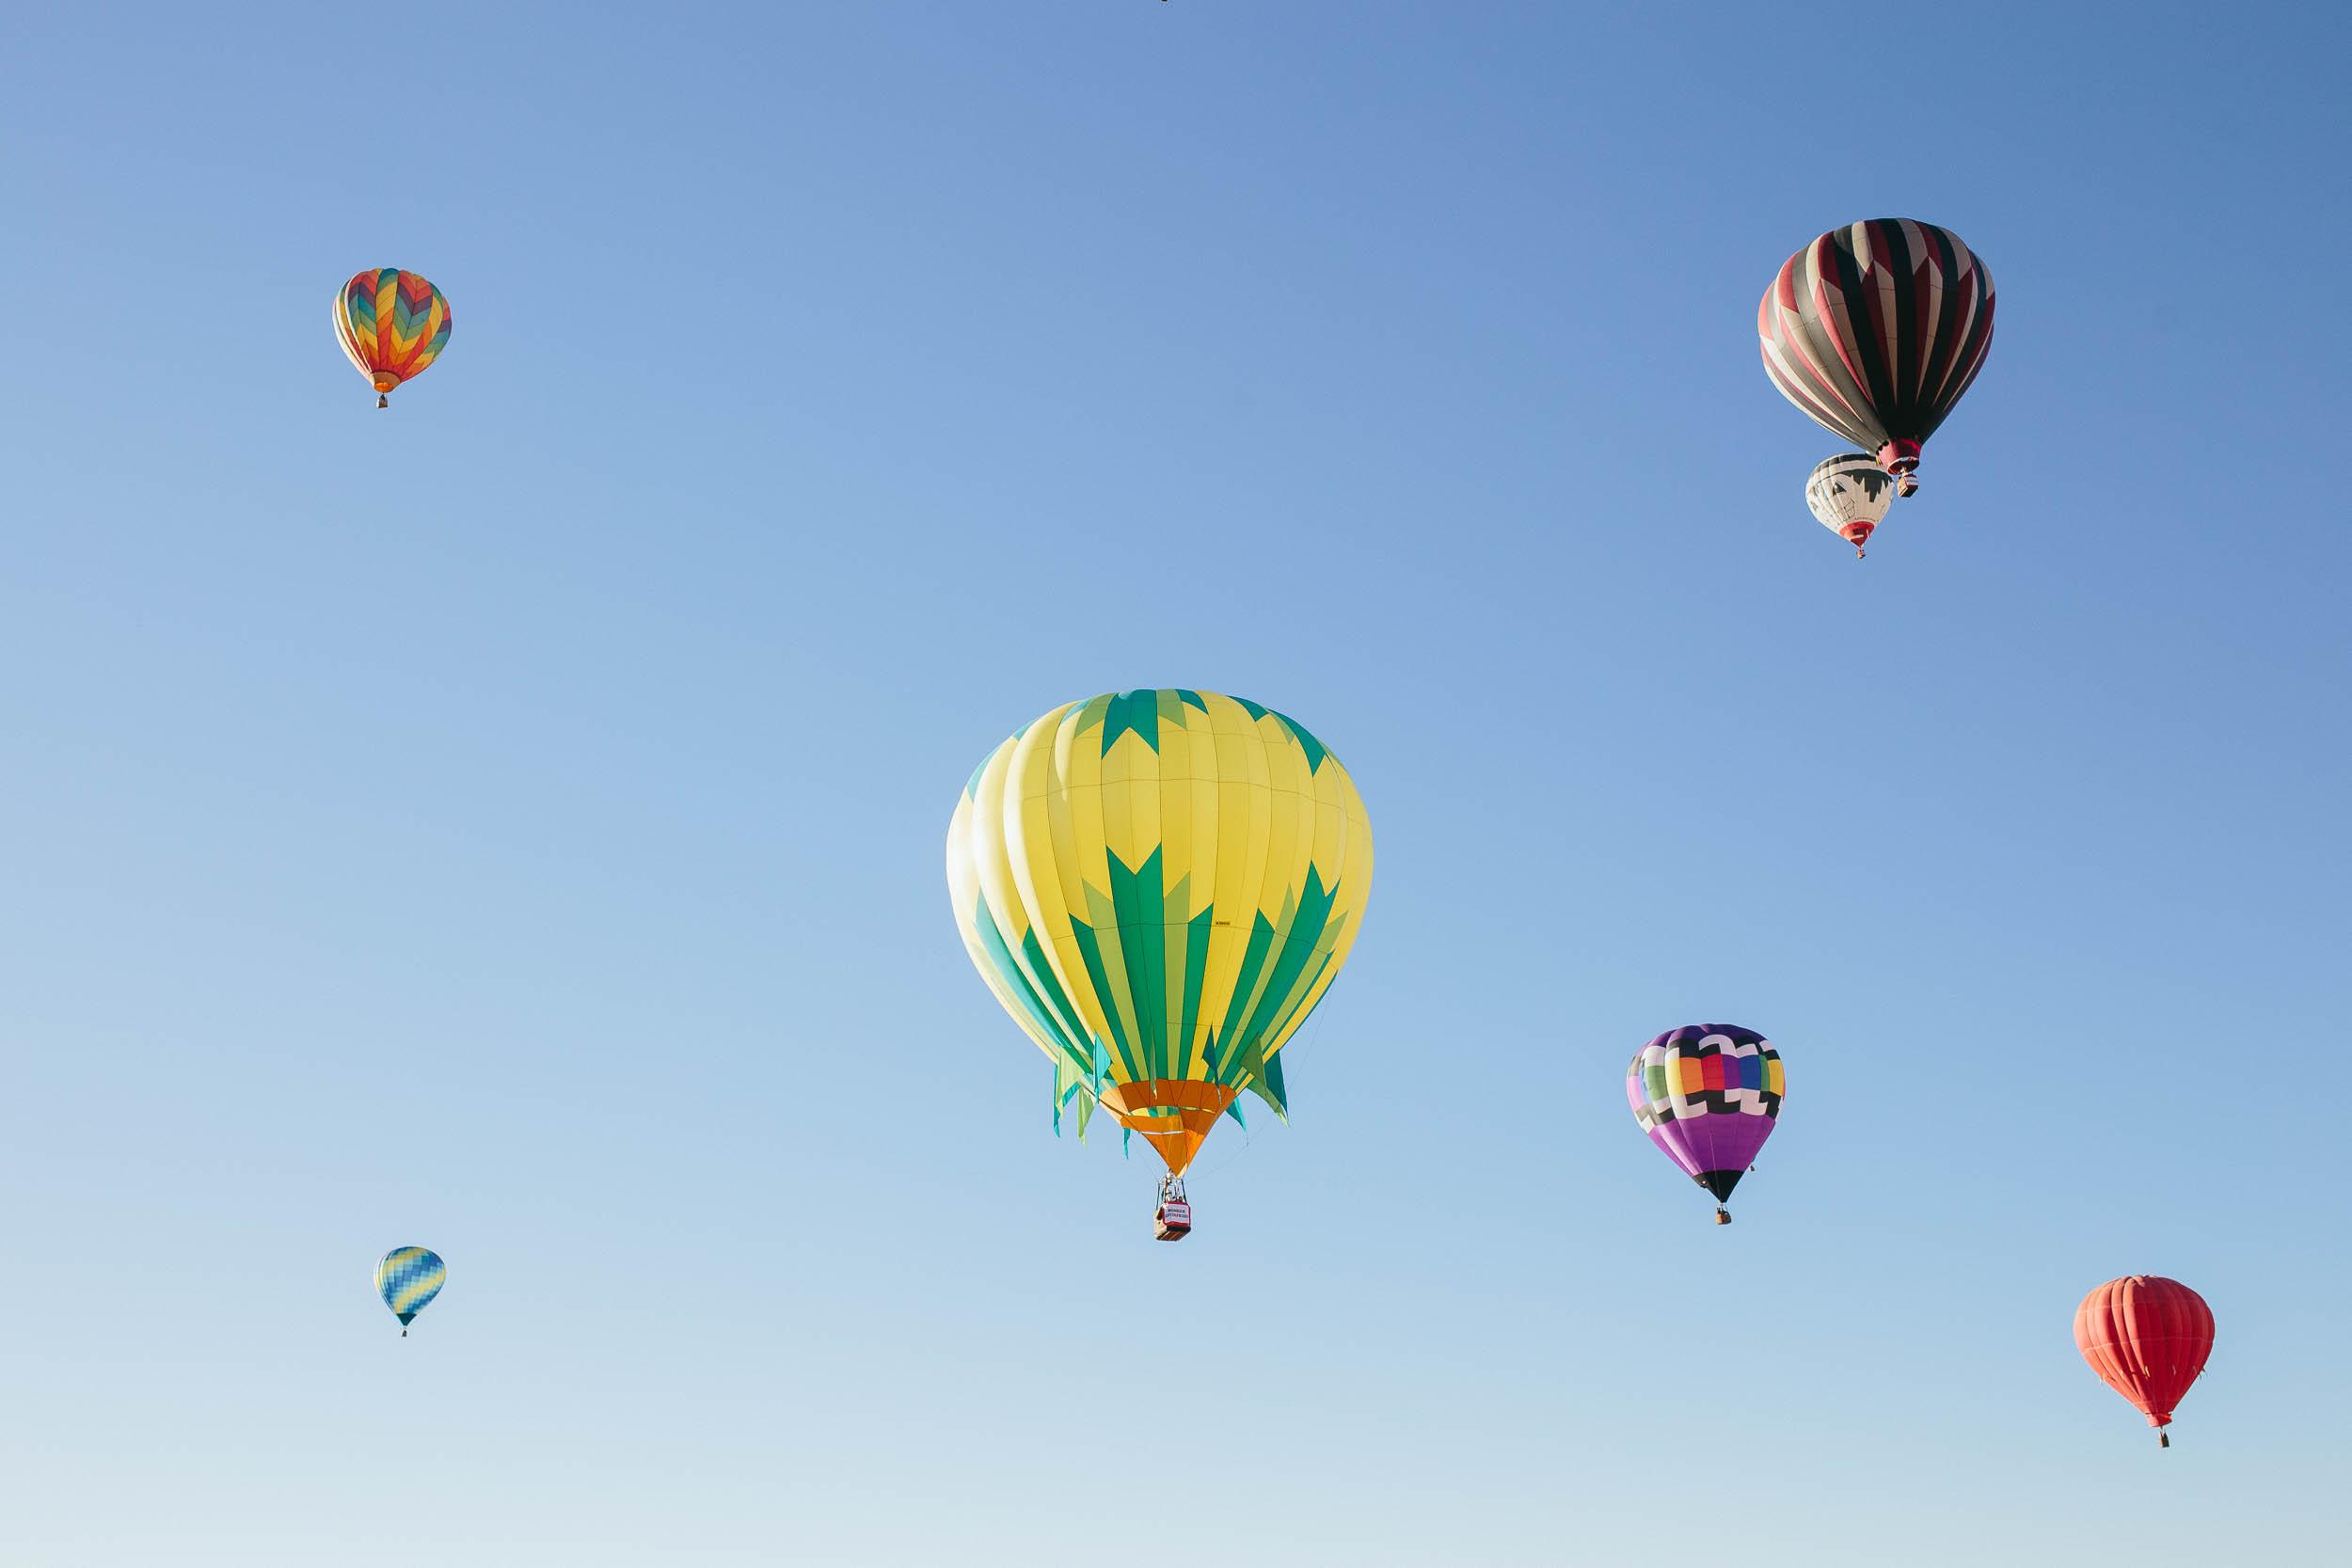 Kyle-Sheppard-Kanab-Balloon-Festival-29.jpg